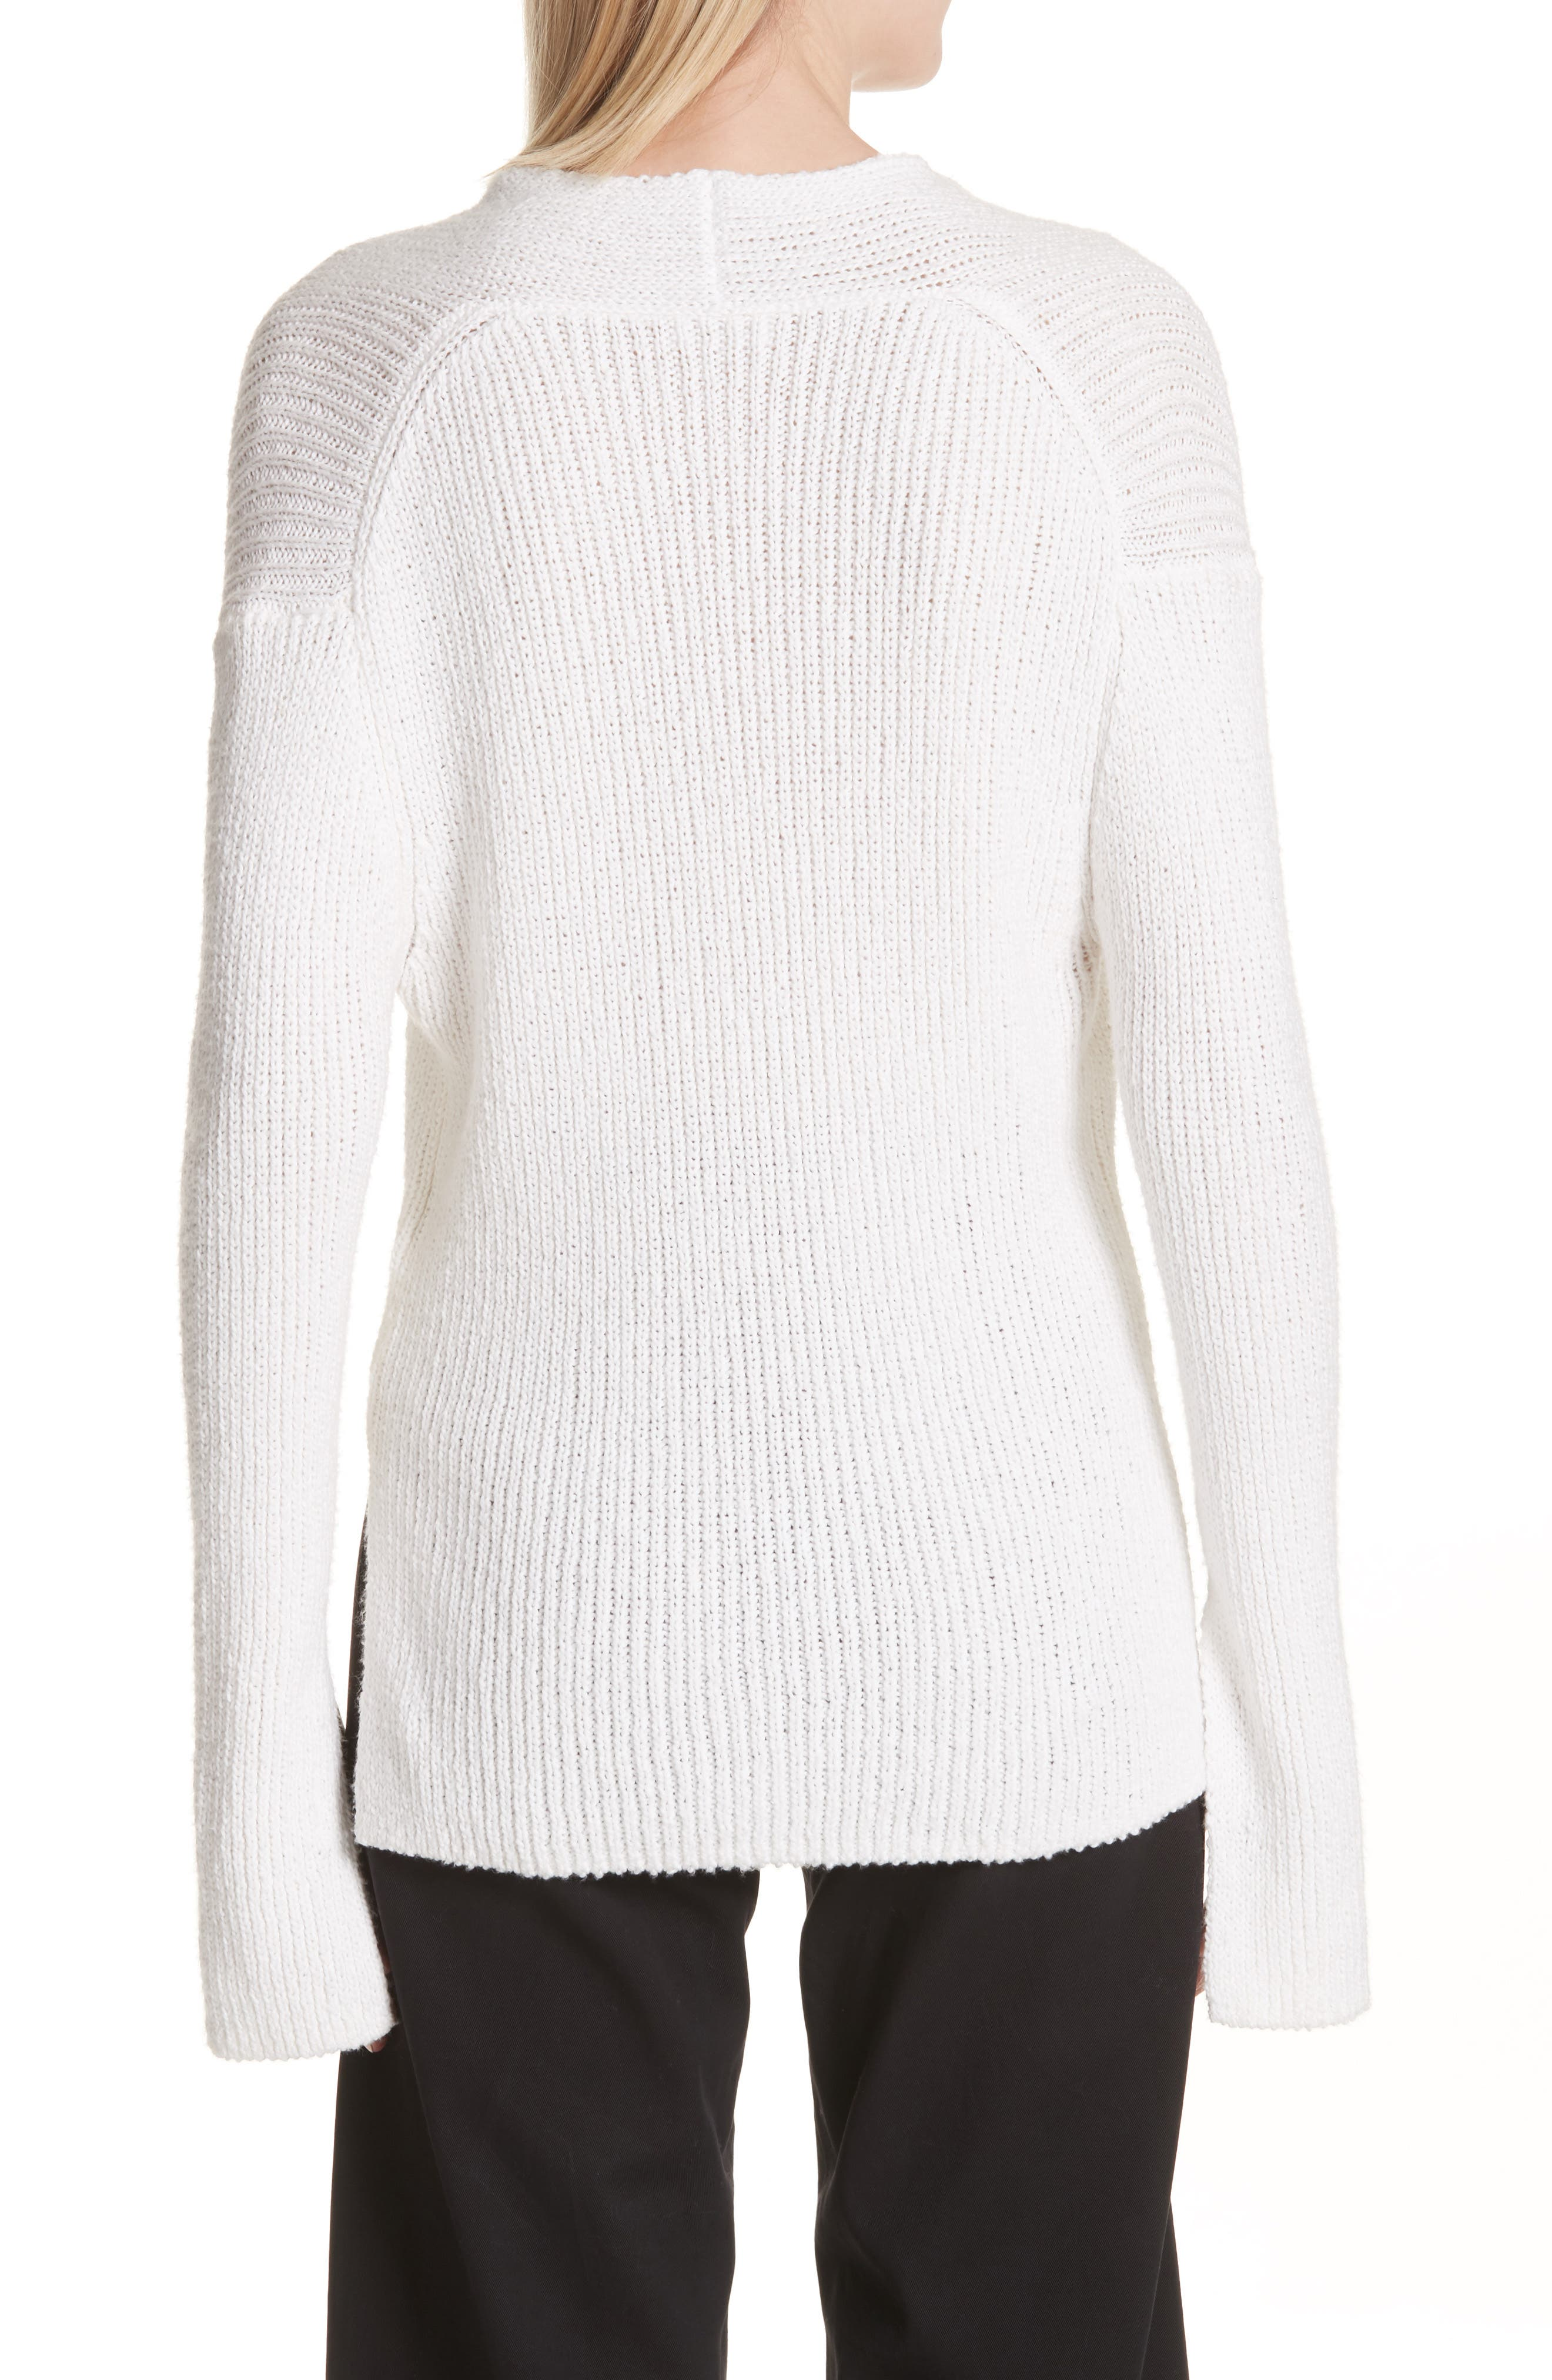 Nick Cotton Sweater,                             Alternate thumbnail 2, color,                             100